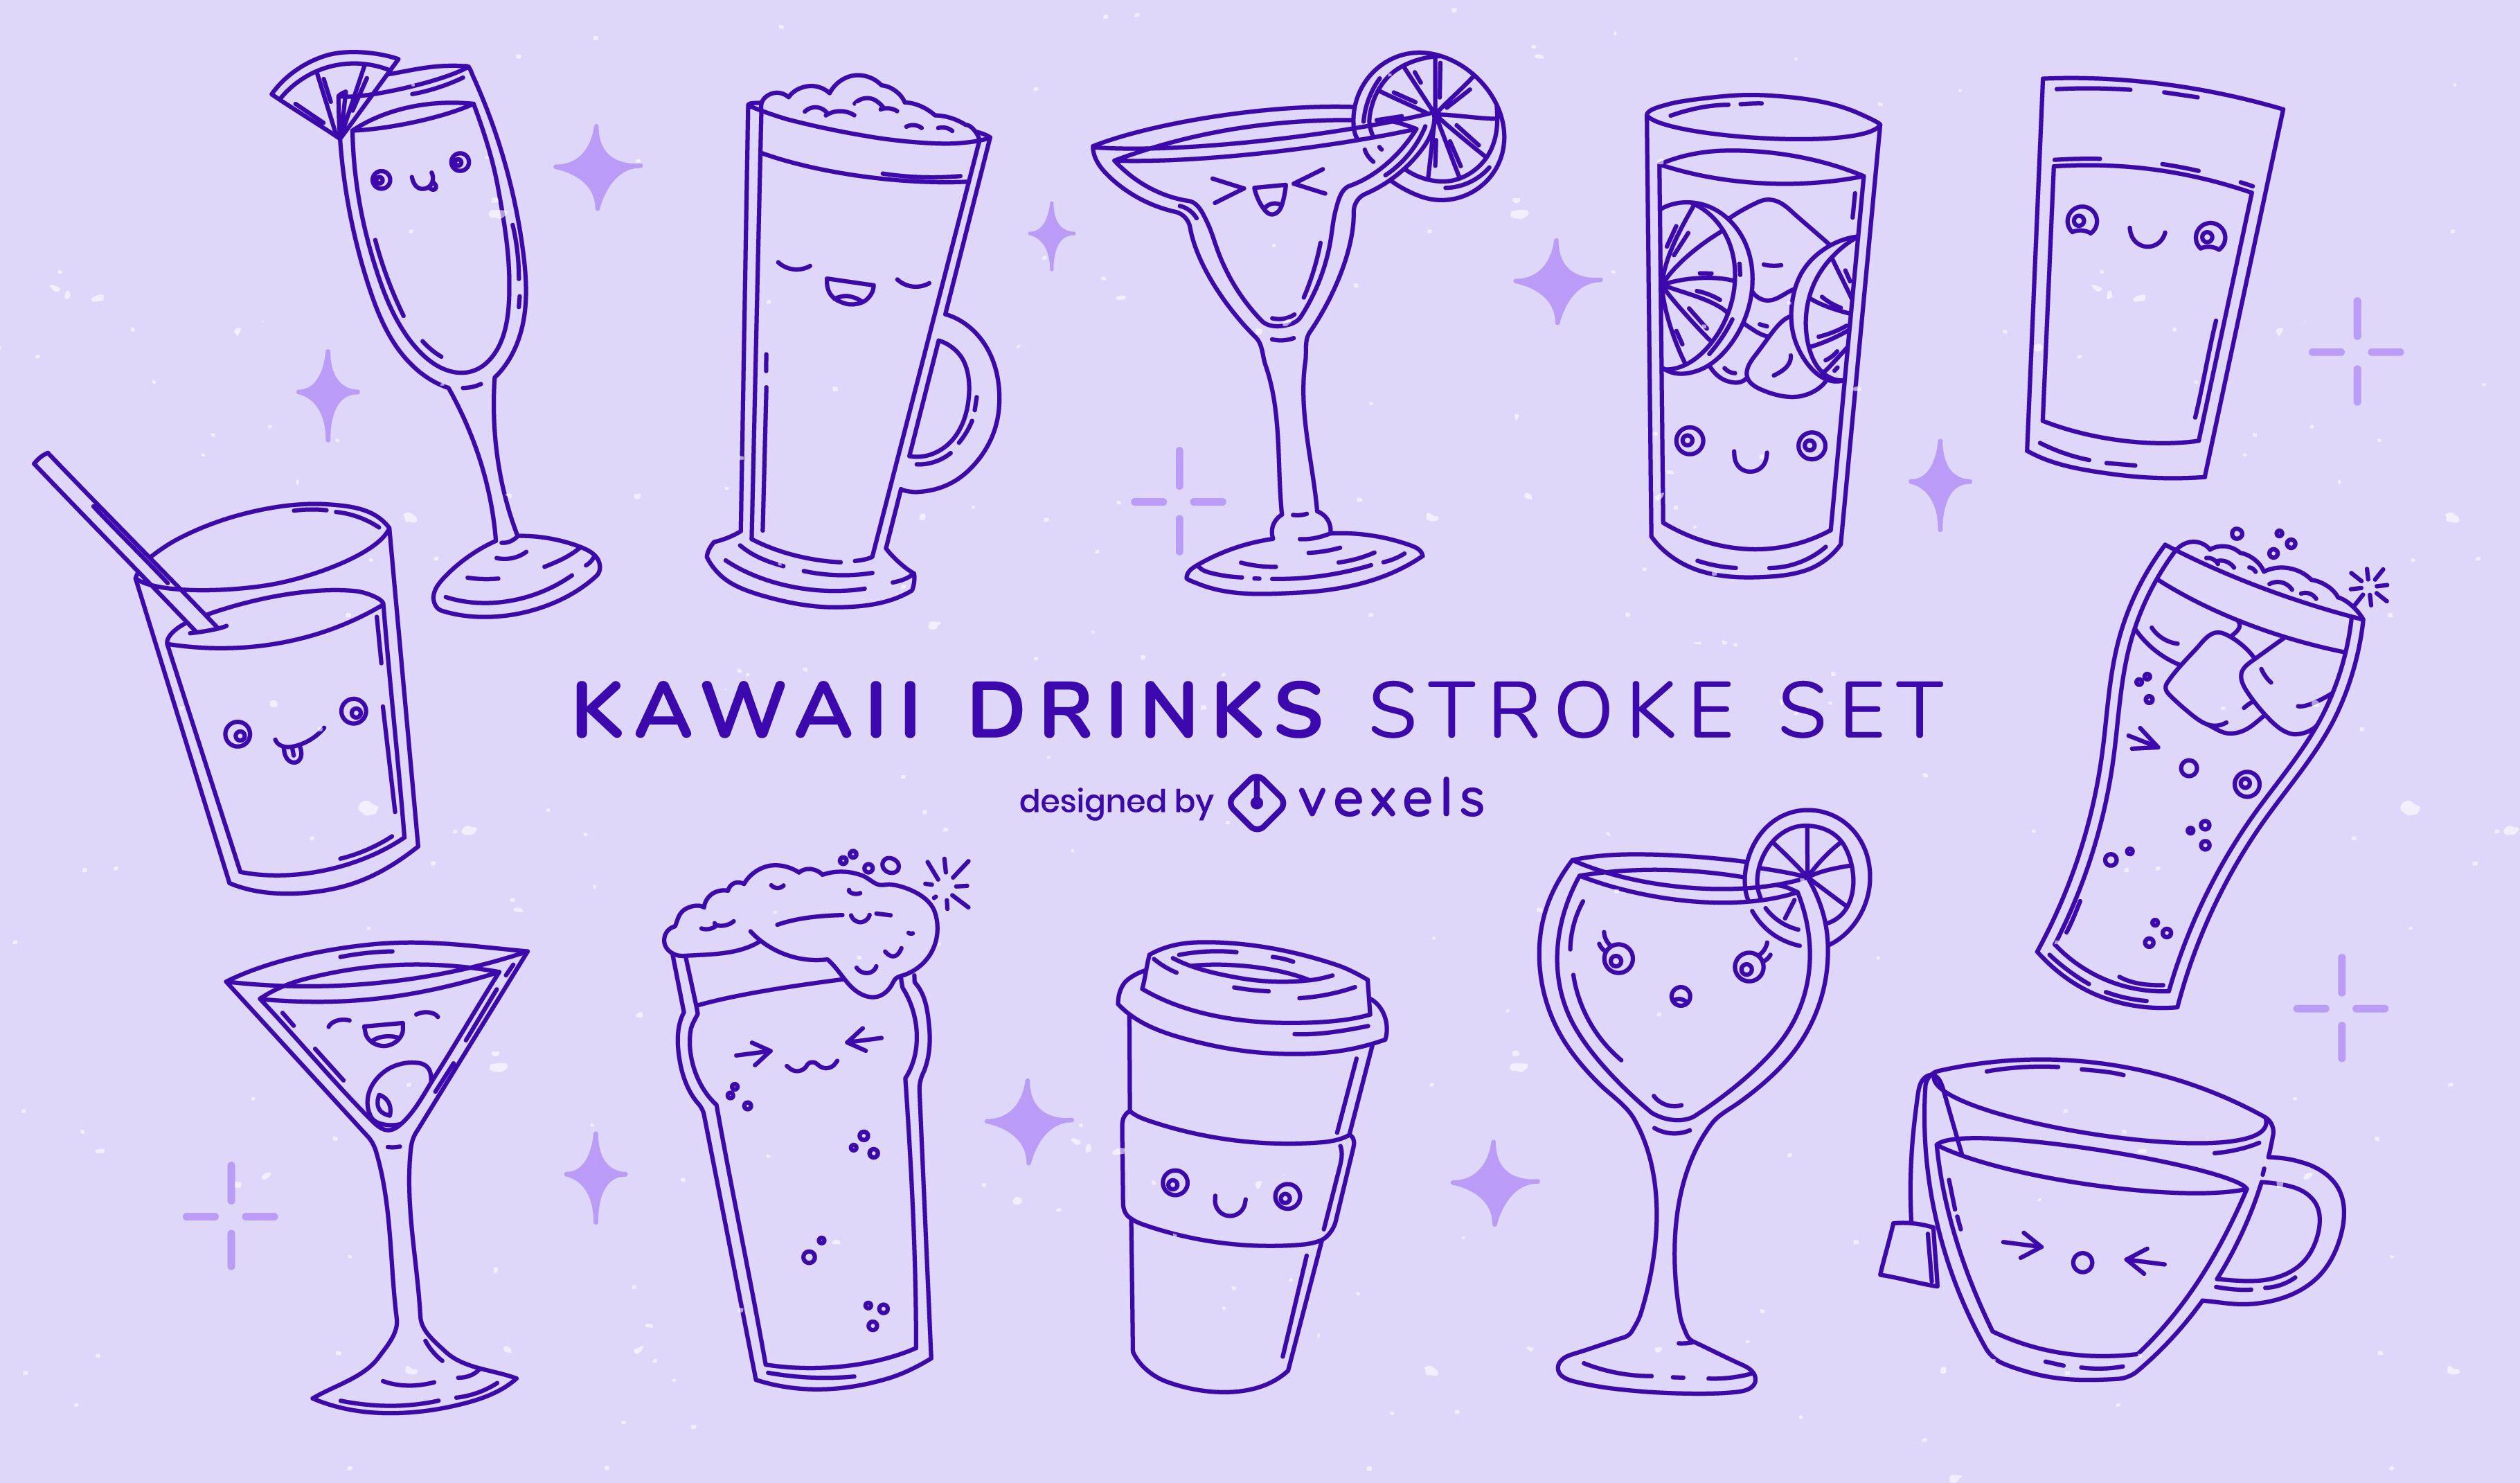 Conjunto de bebidas e copos kawaii para derrame